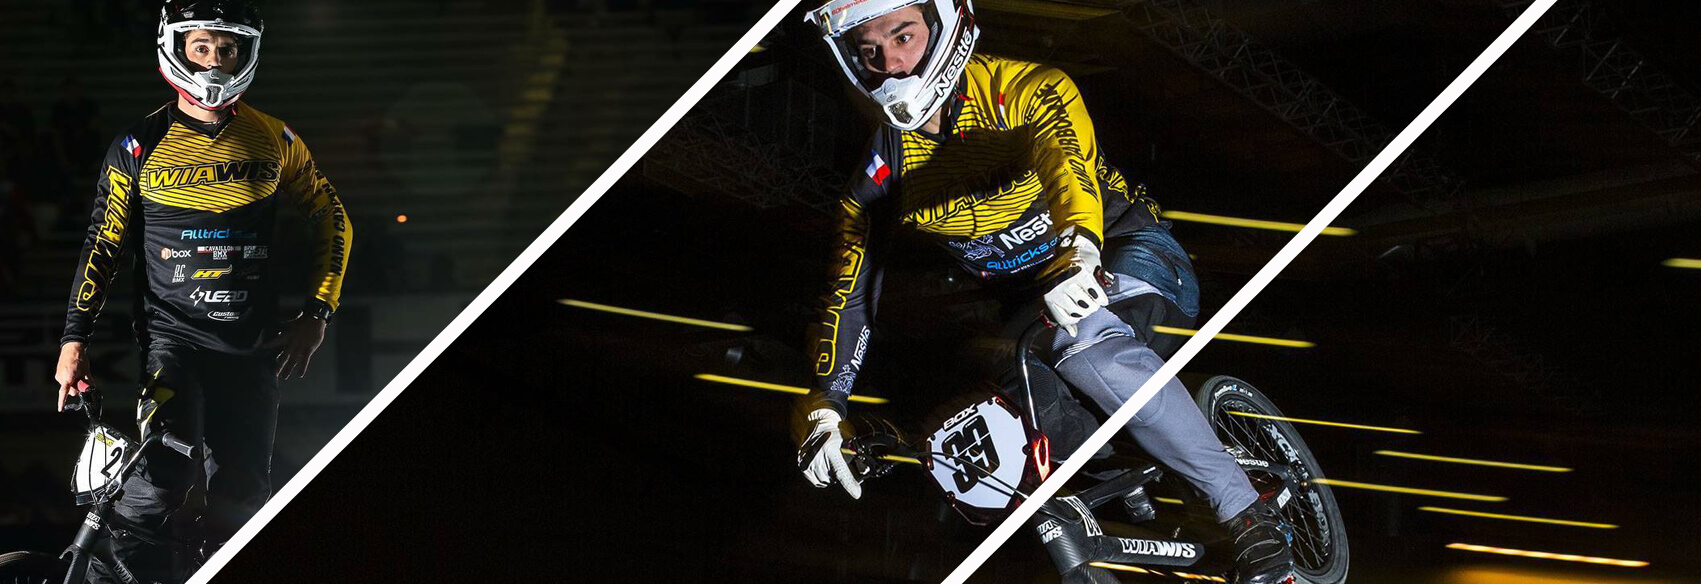 Sylvain Andre - Fabmx1.com - Steve Diamond